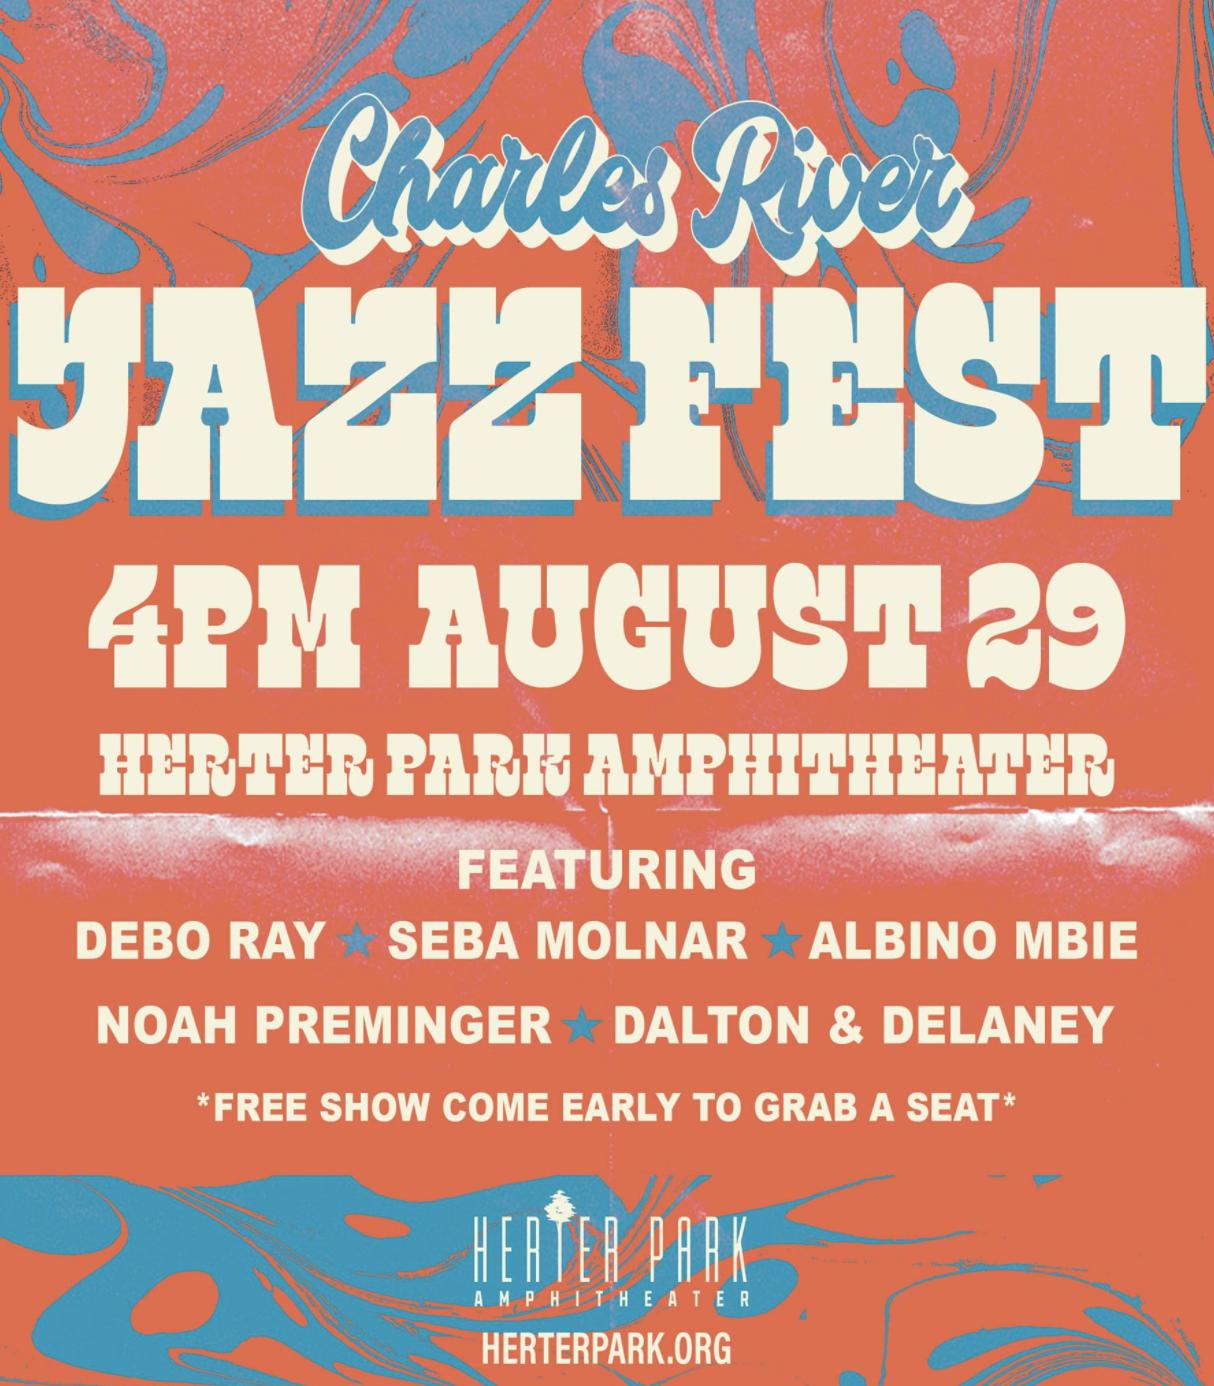 Charles River Jazz Festival